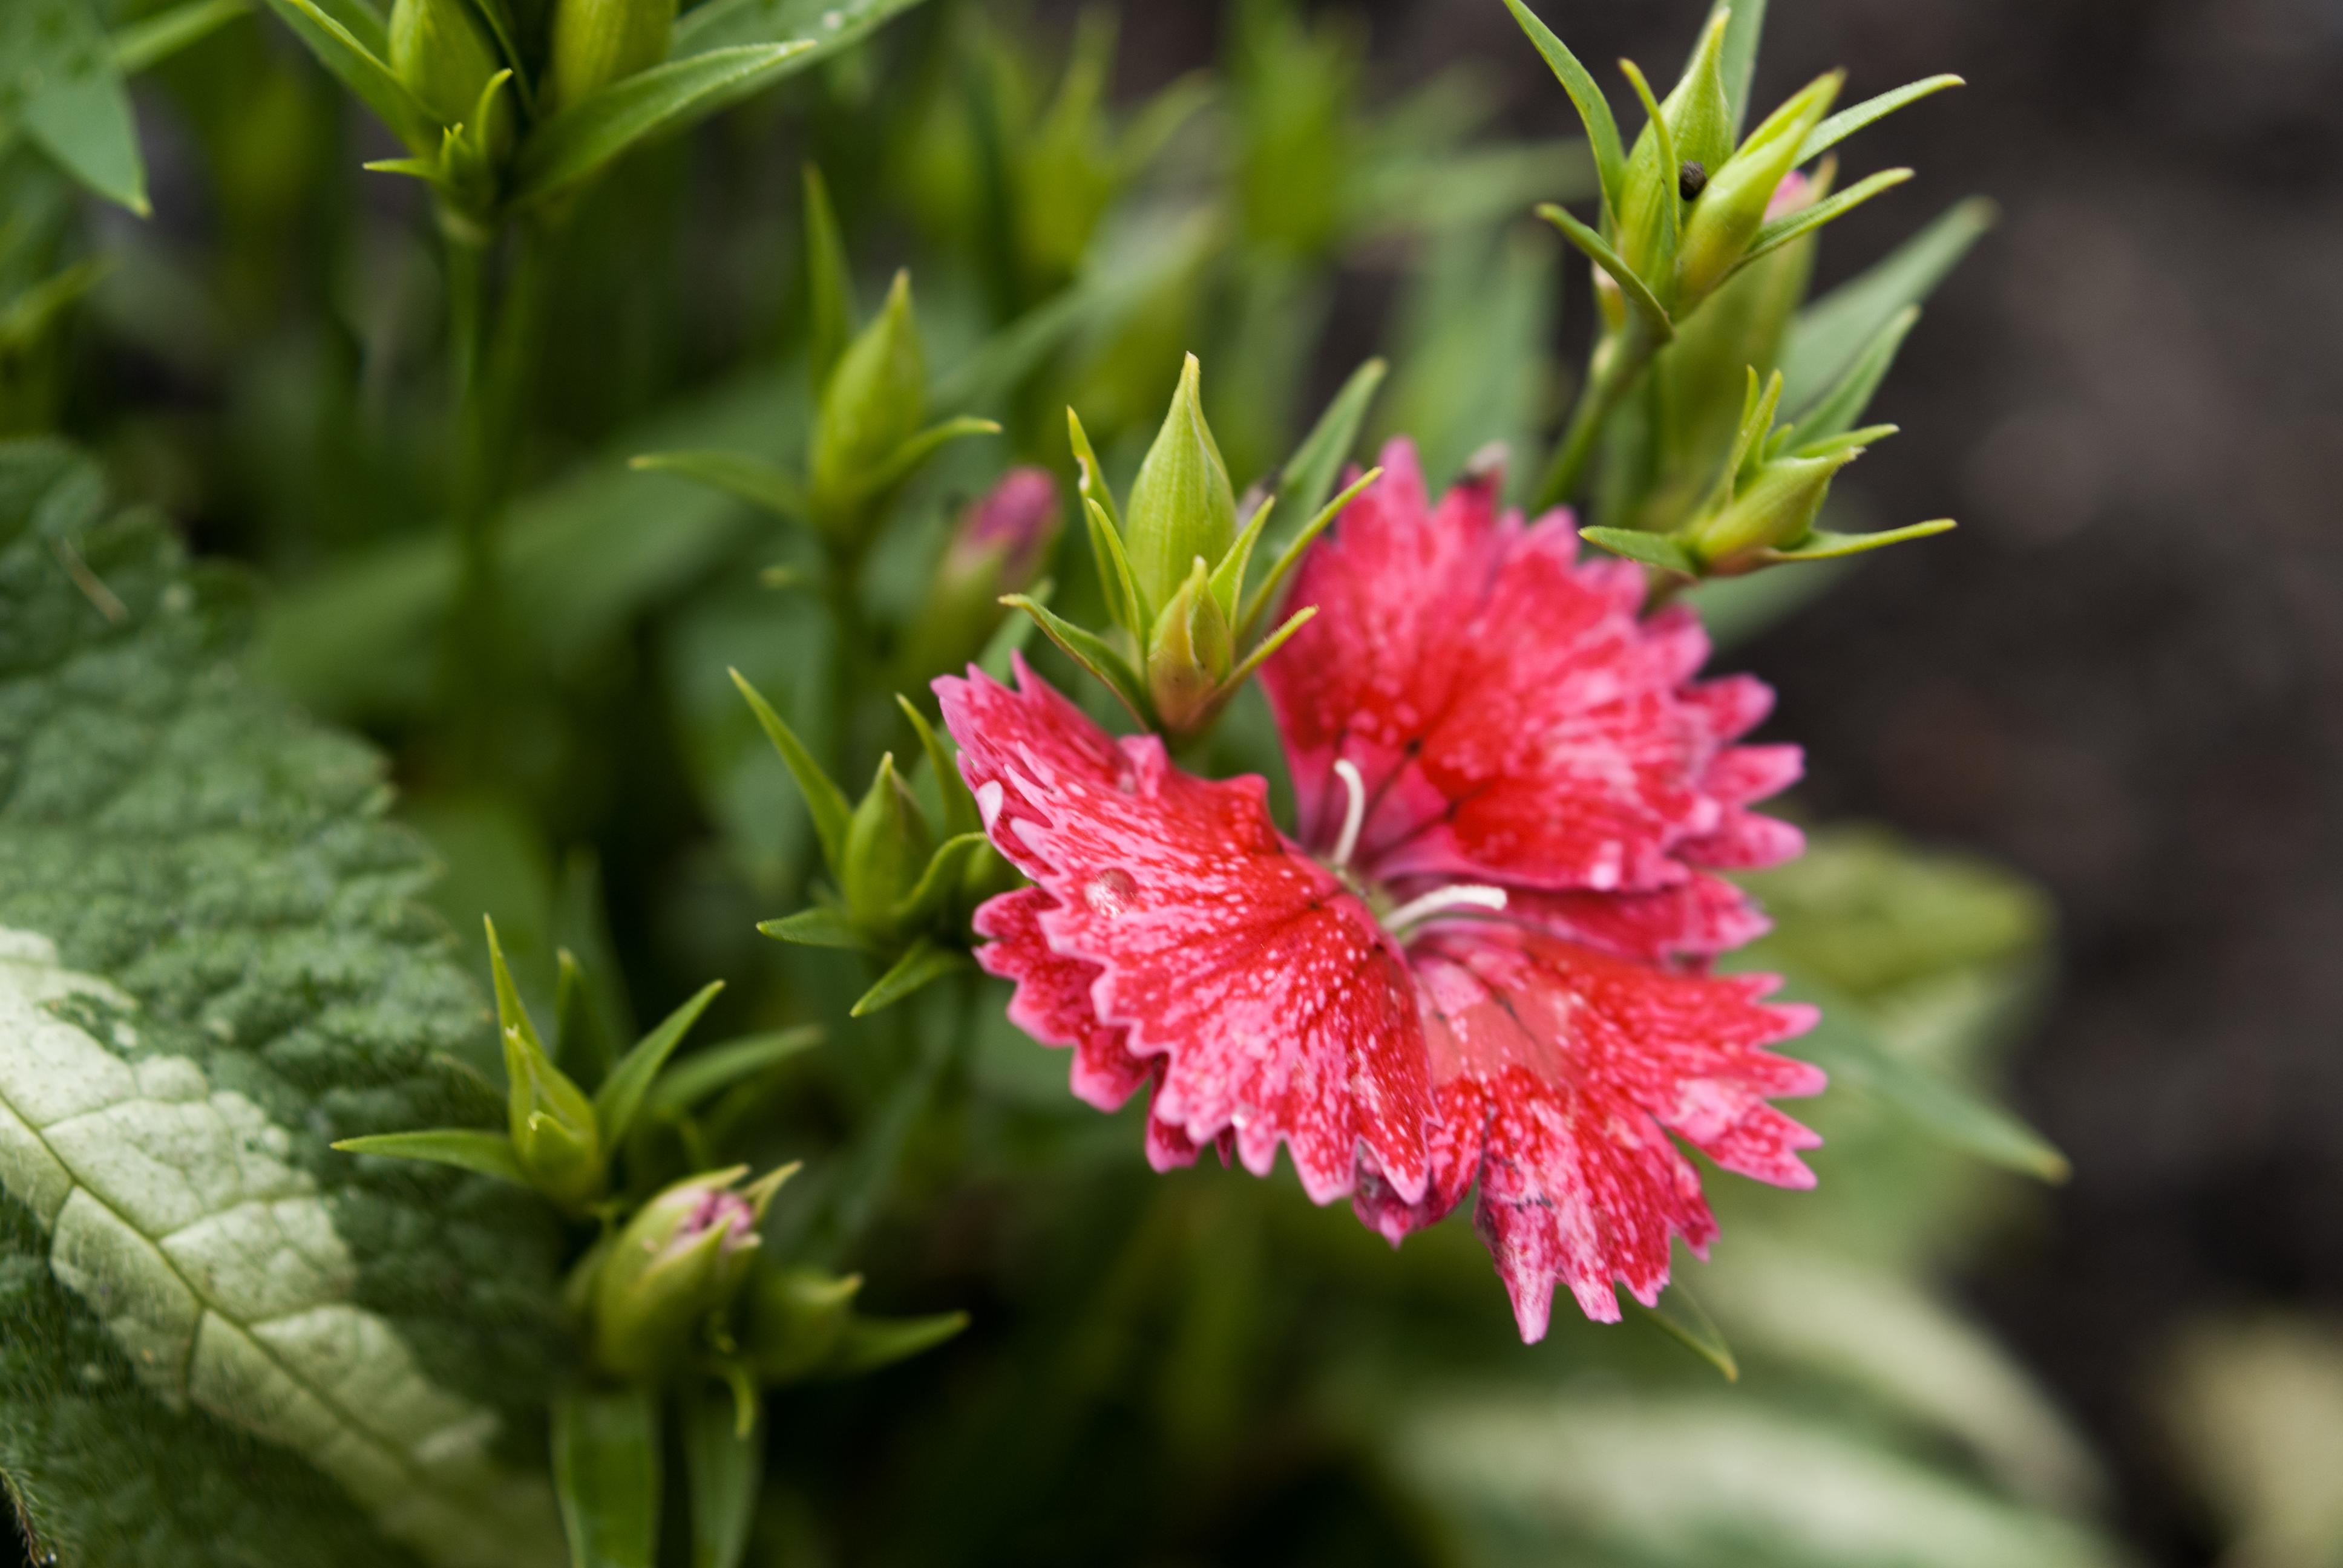 Macro flower and leaf photo